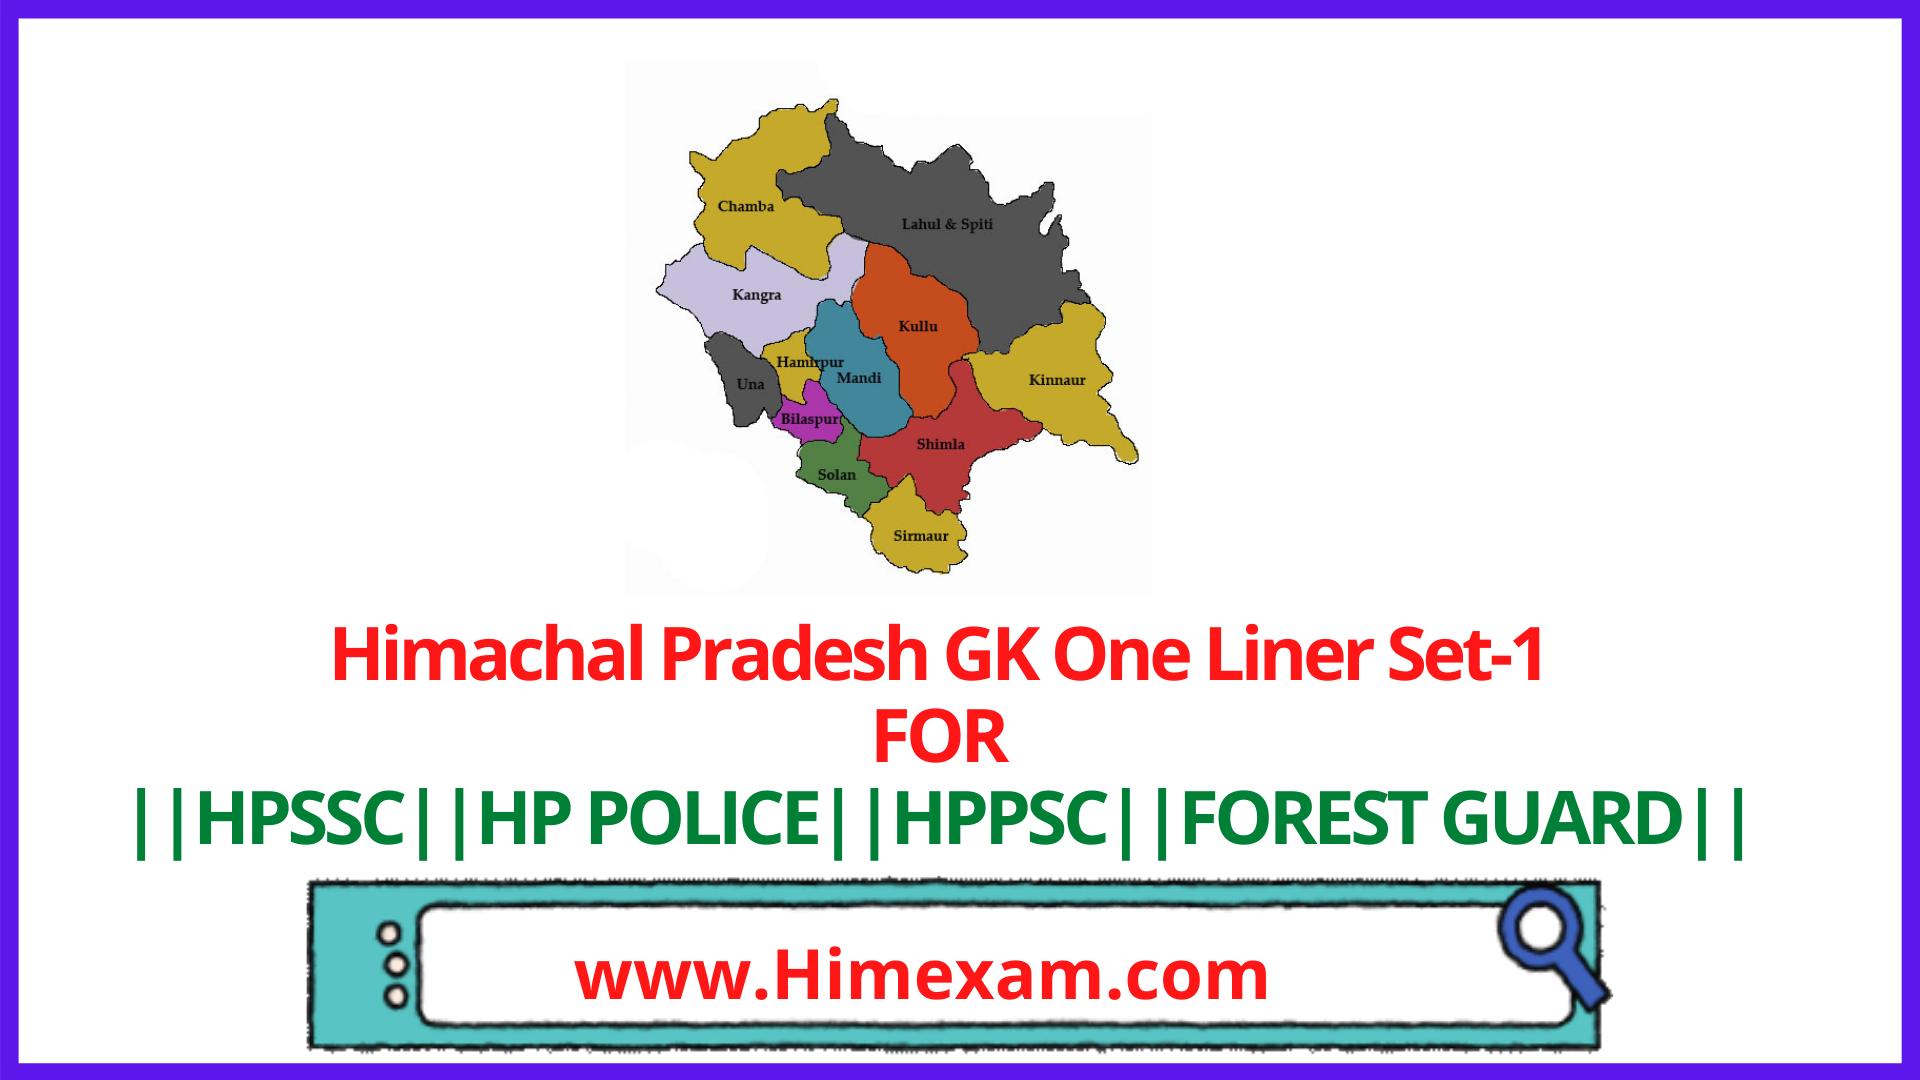 Himachal Pradesh GK One Liner Set-1